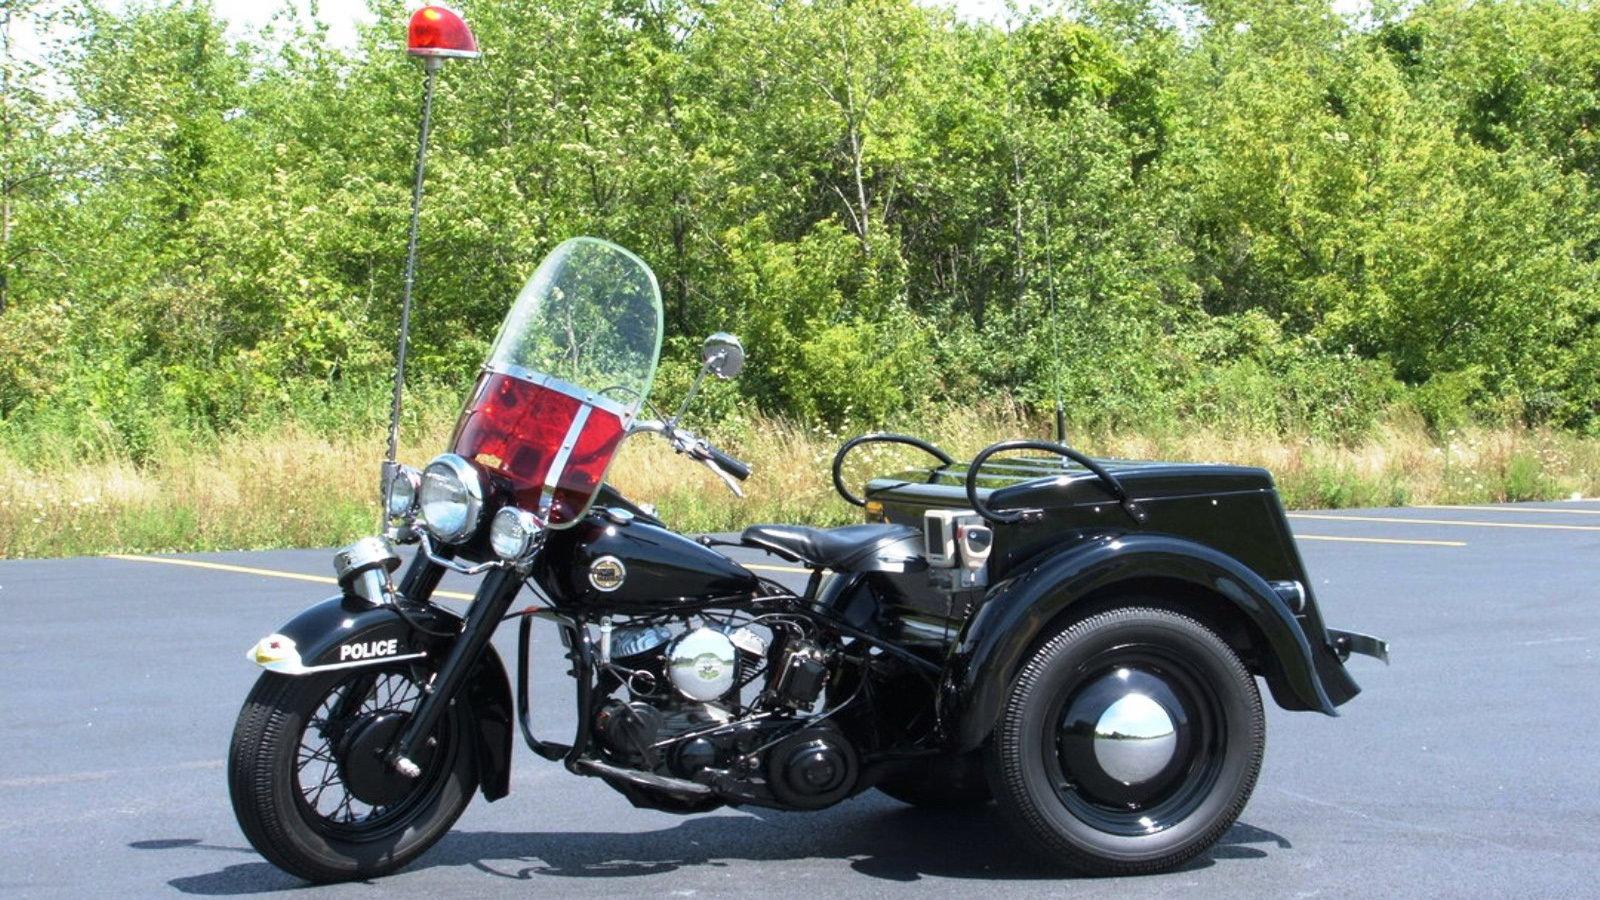 1960's Police Servi-Car